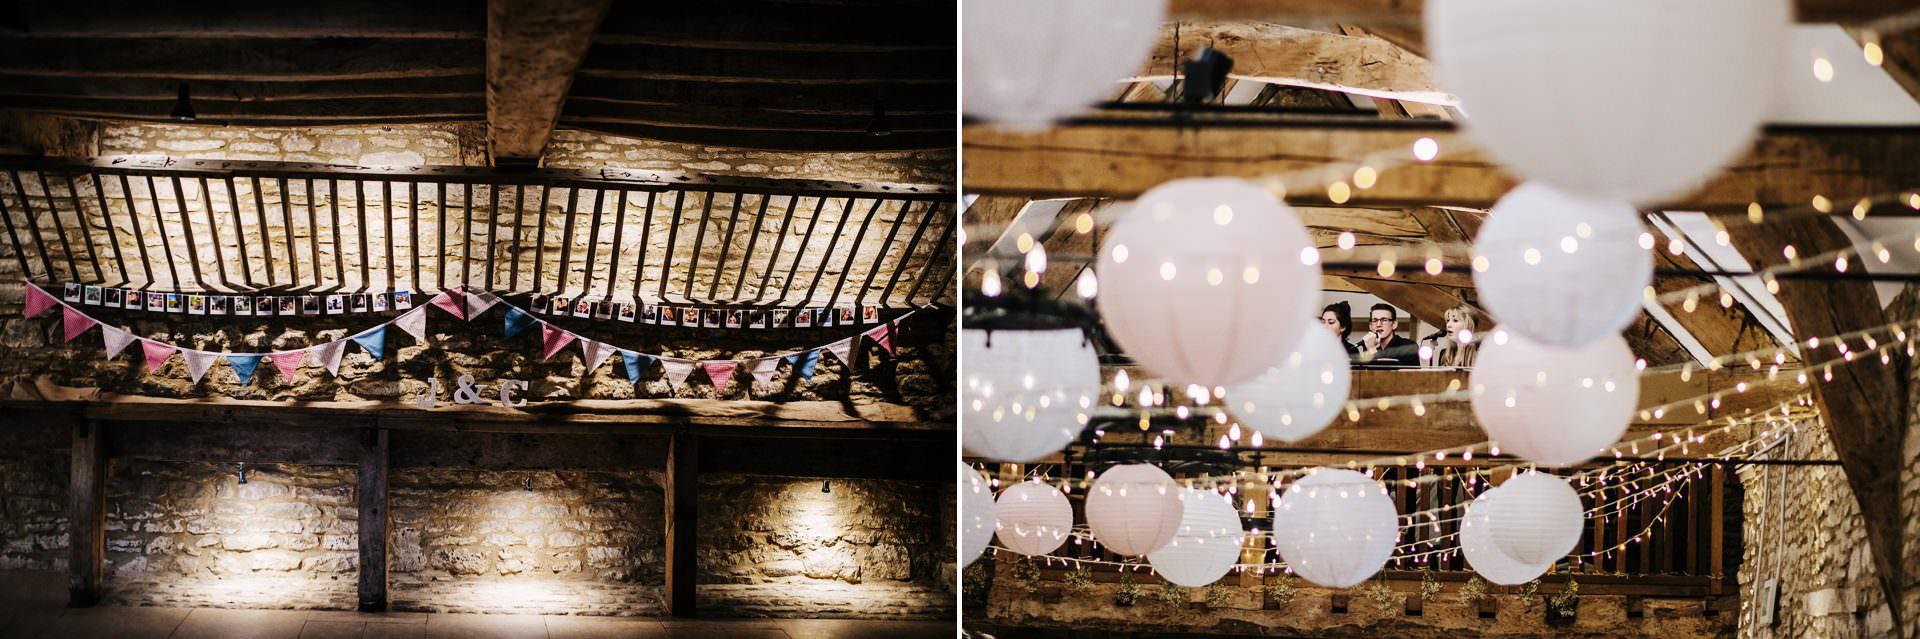 Caswell House Wedding Photographer - Jessica & Chris 2